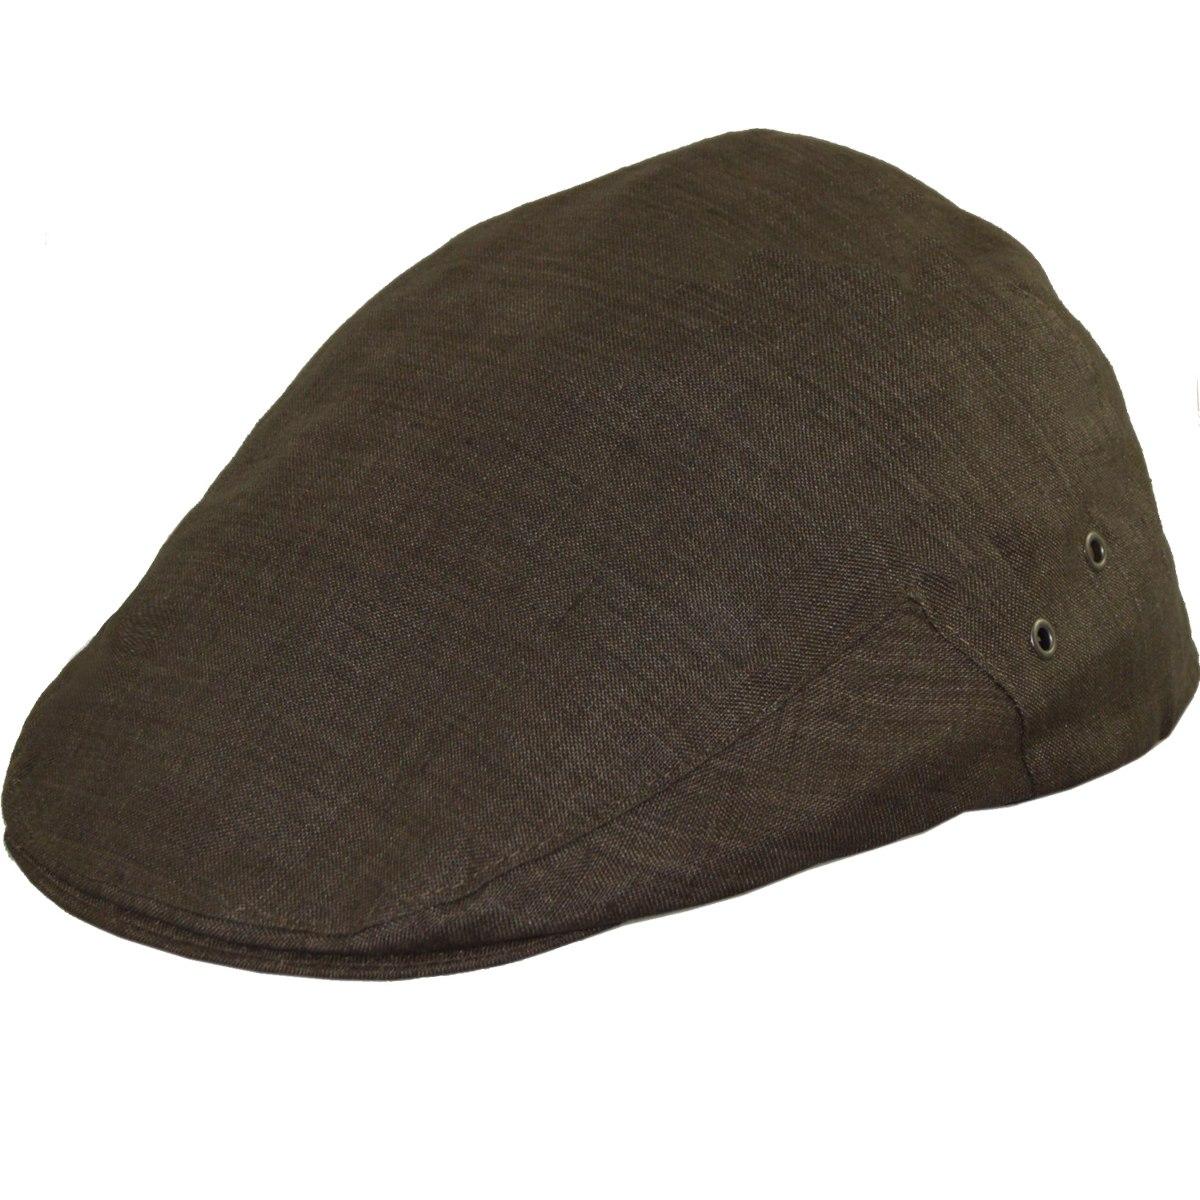 boina clasica 100% lino compañia de sombreros h736000-70. Cargando zoom. 023f2fc32d3